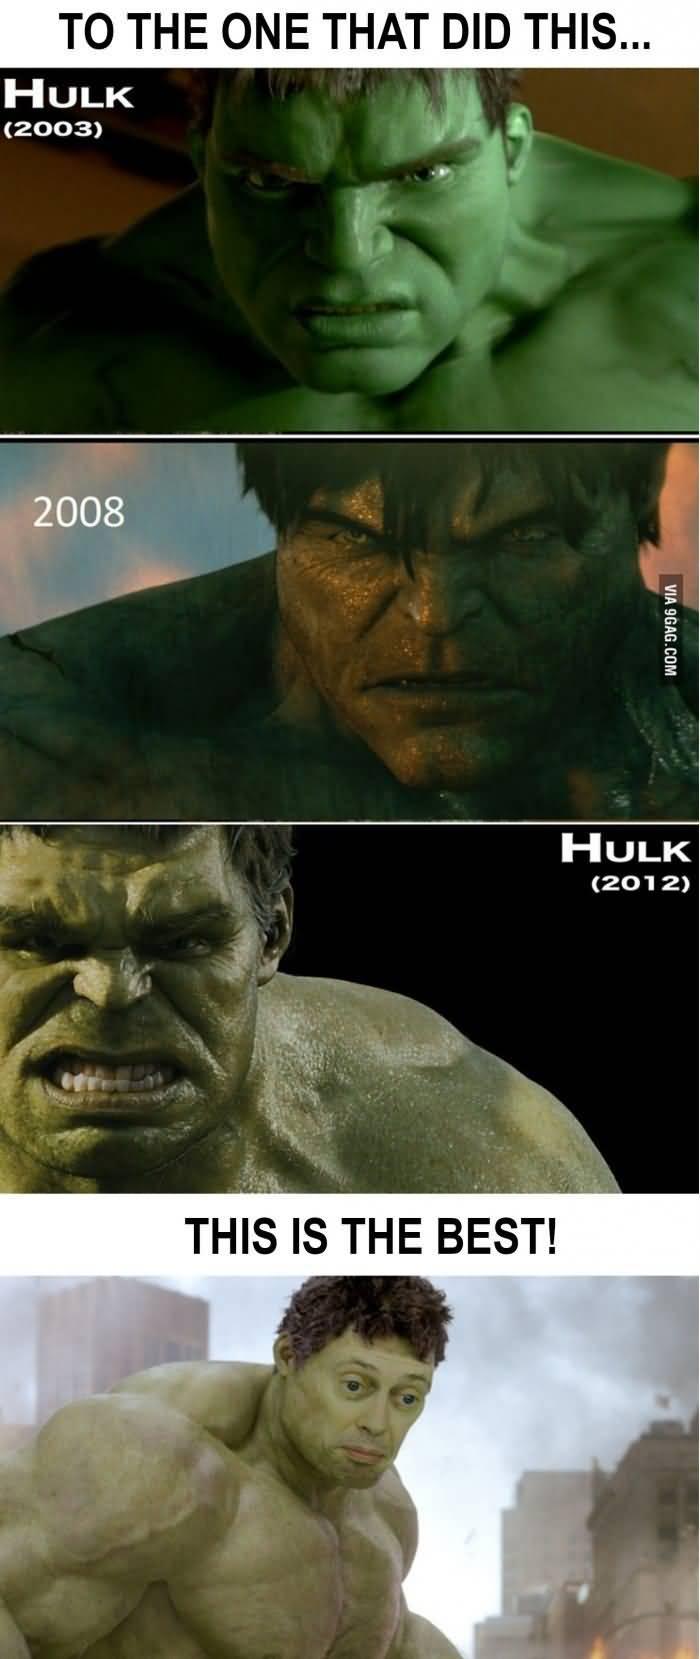 19 Very Funny Hulk Meme That Make You Sarcastic Laugh ...